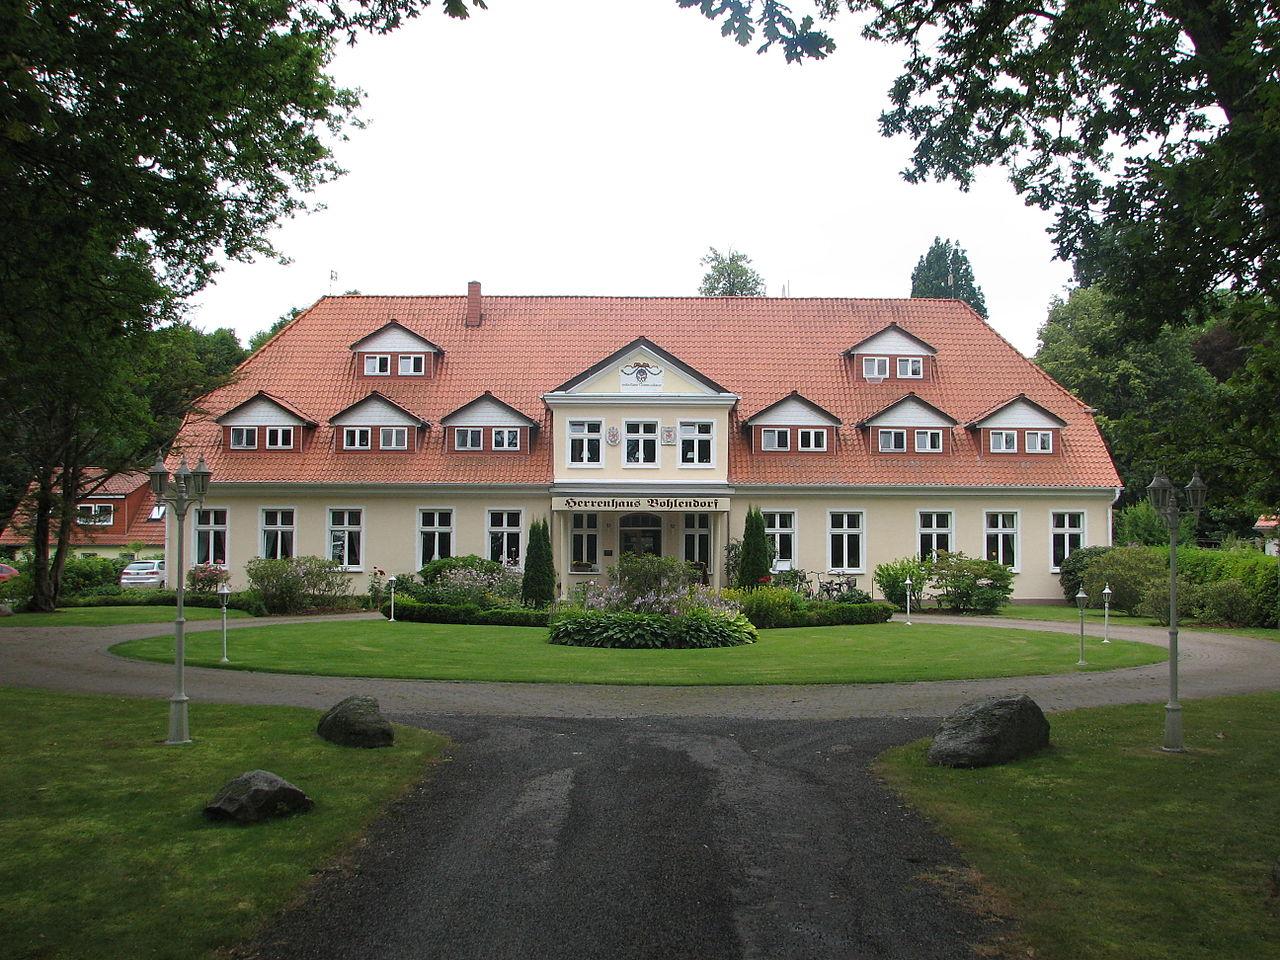 Bild Herrenhaus Bohlendorf